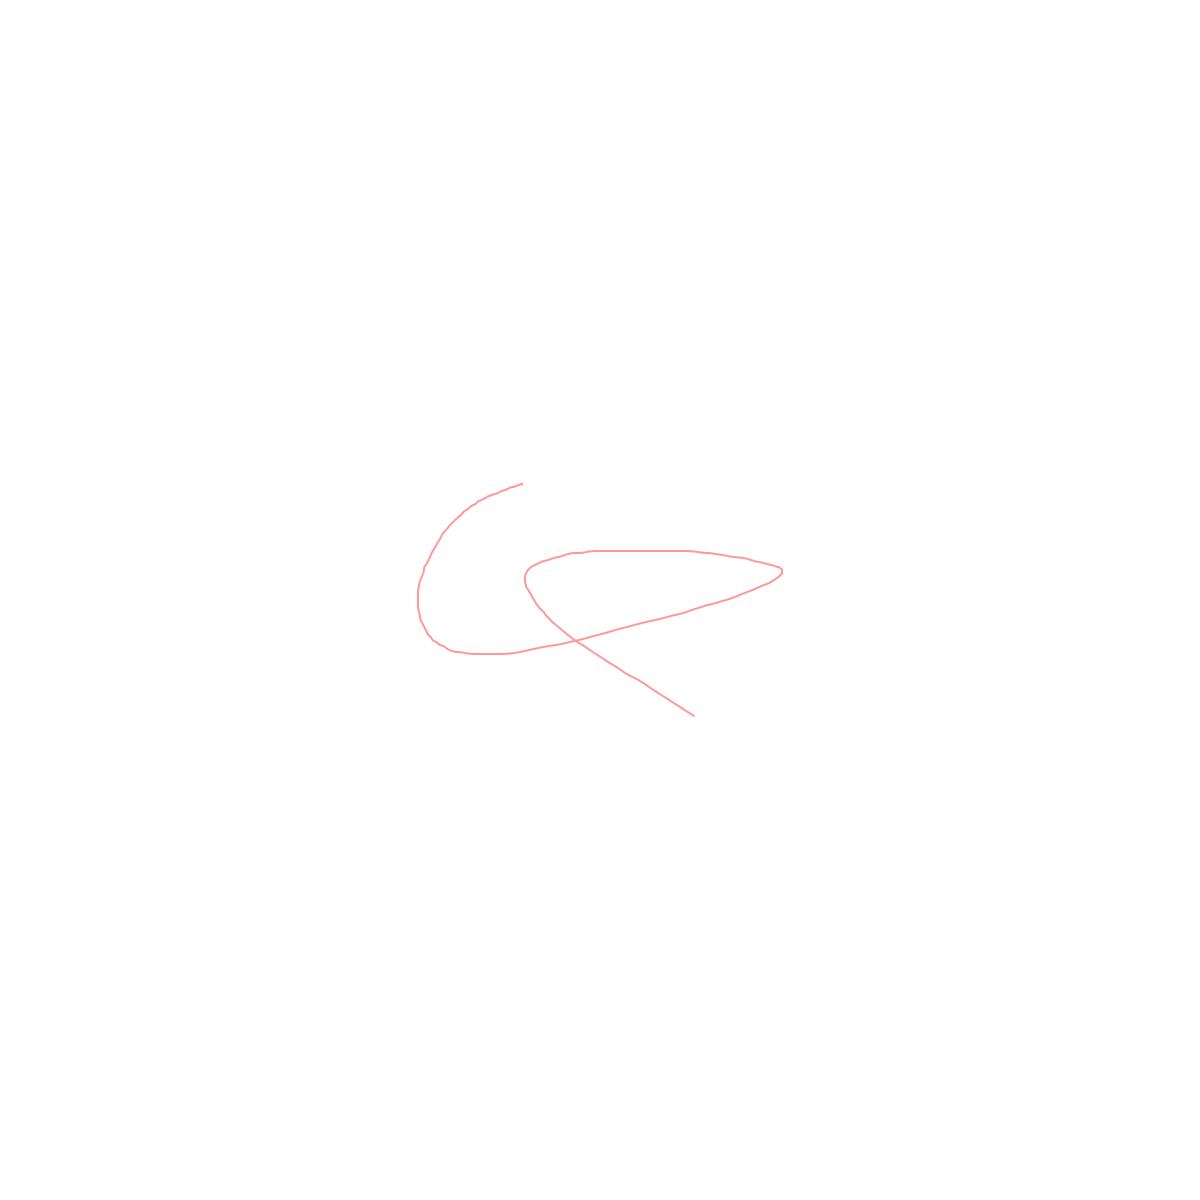 BAAAM drawing#12066 lat:49.6267433166503900lng: 6.1589040756225590